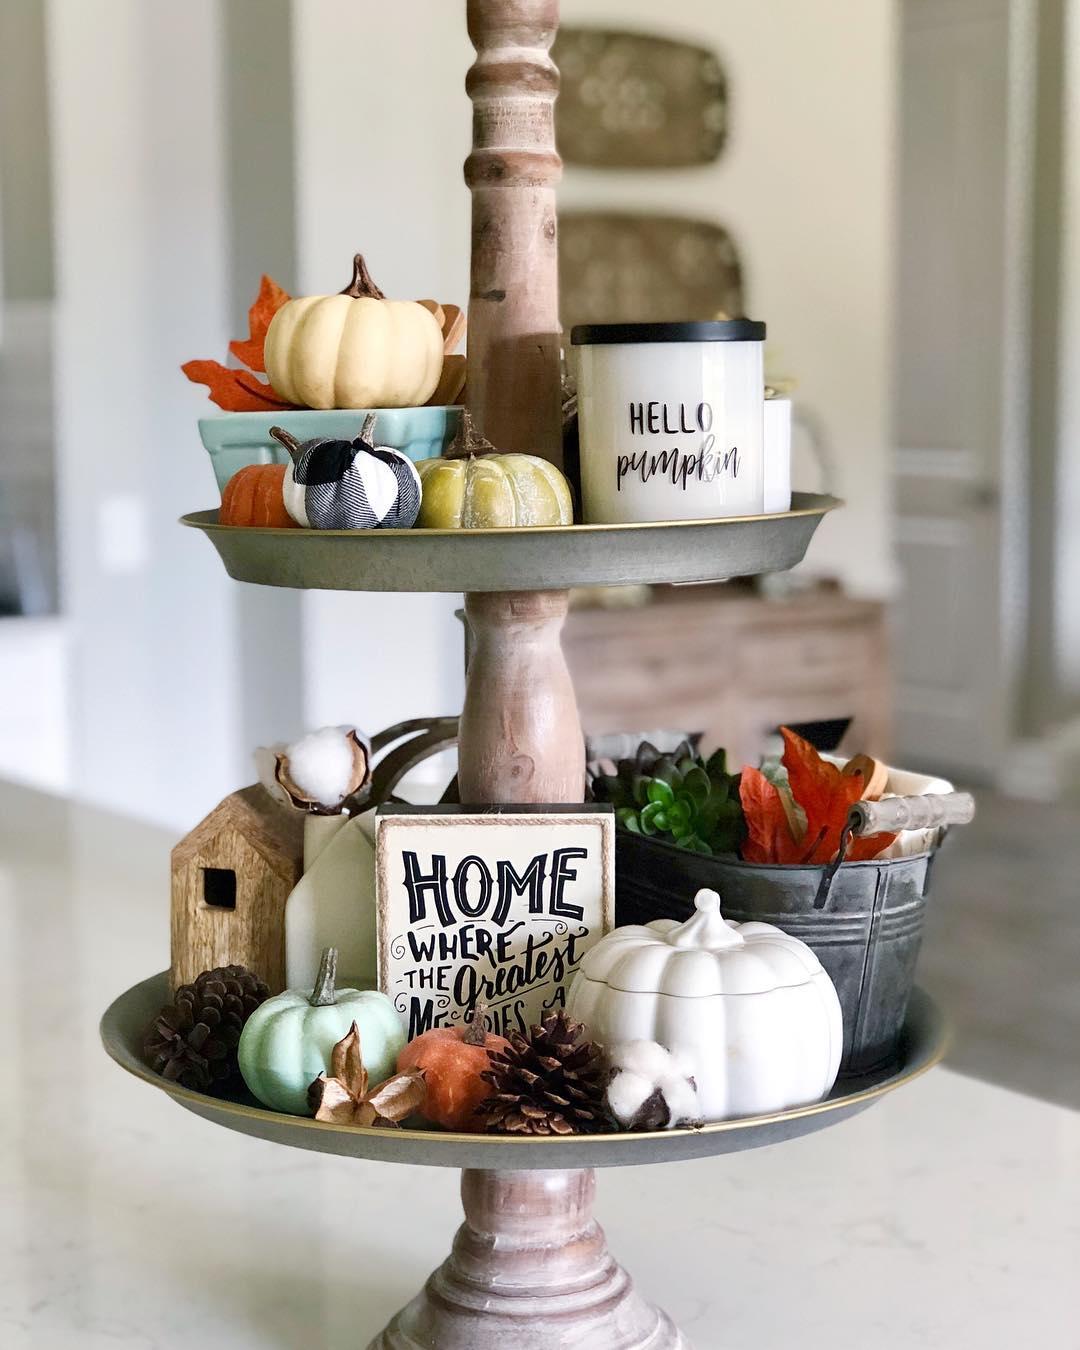 Basic Pumpkin Halloween Decor Idea. Pic by kbukovan